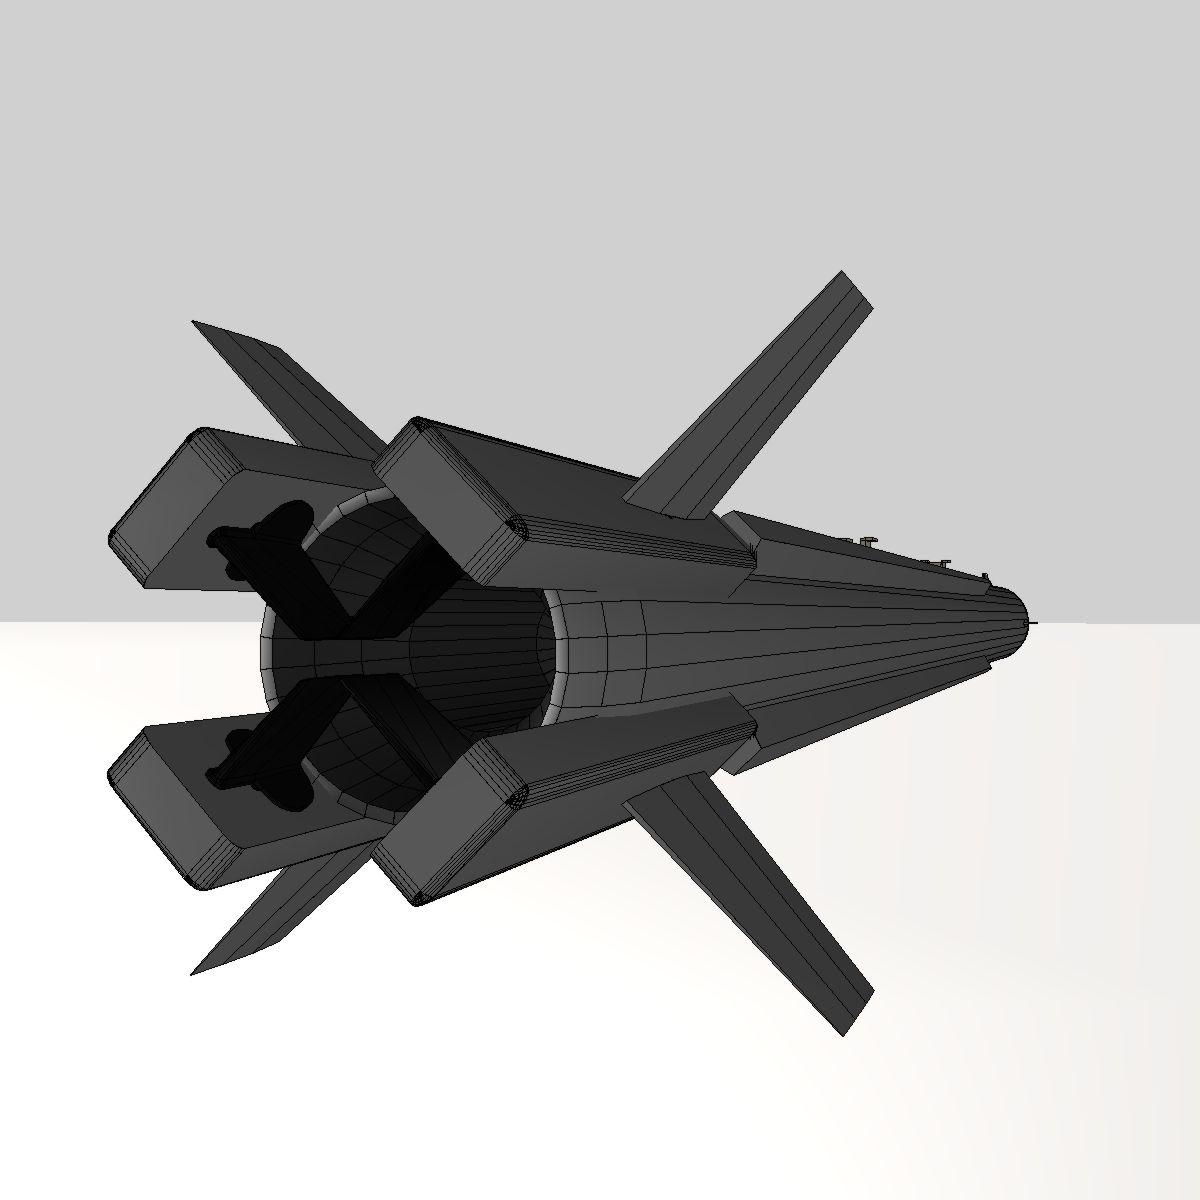 a-darter air-to-air пуужин 3d загвар 3ds dxf cob x obj 151889